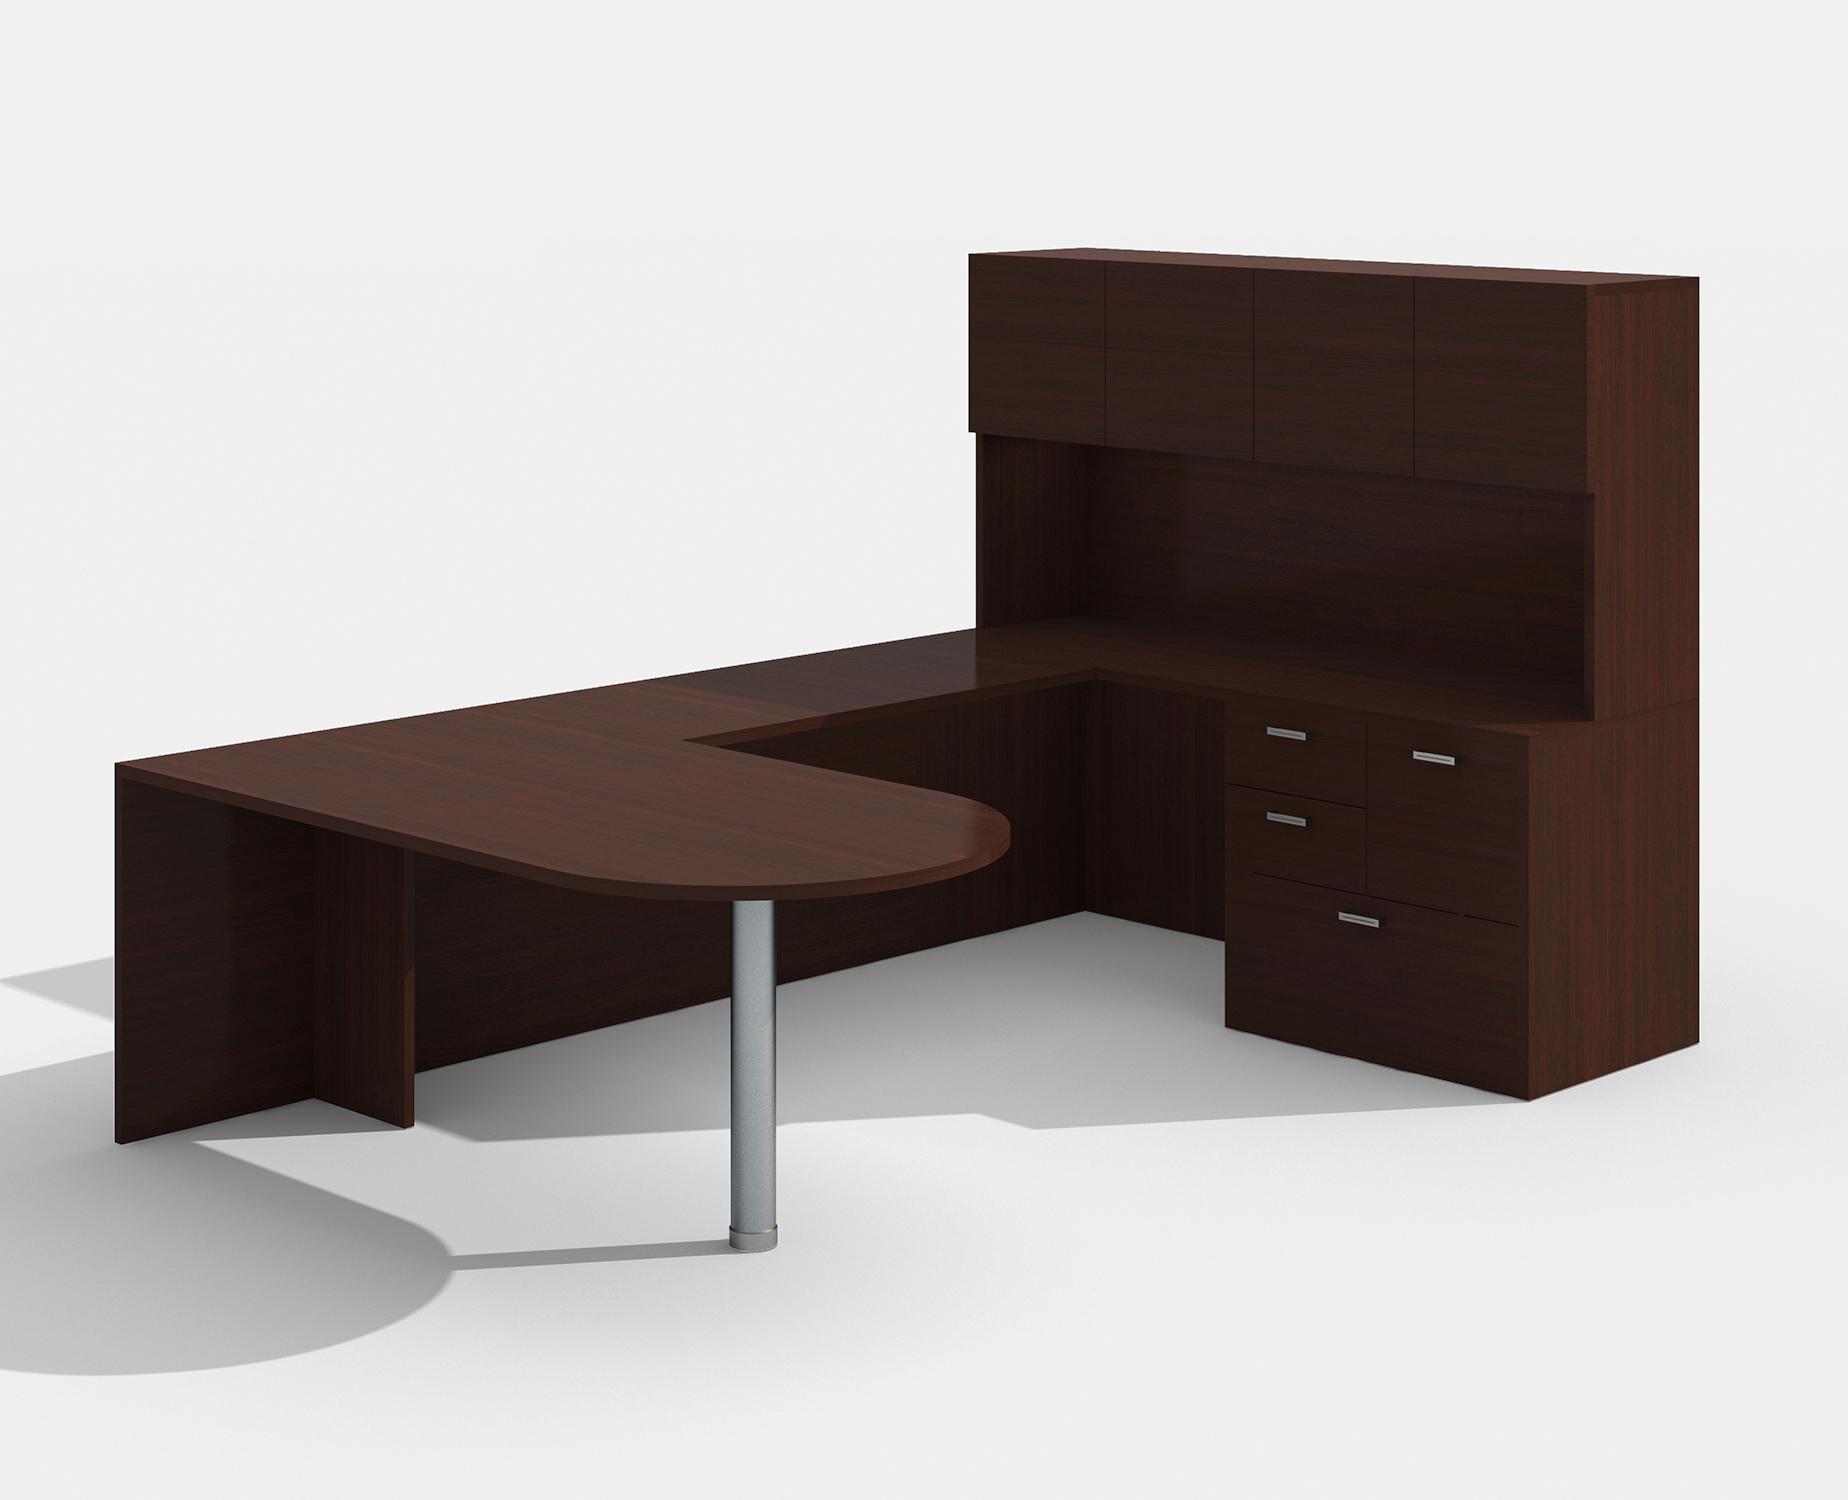 mahogany am-363n amber bullet shape u desk with hutch